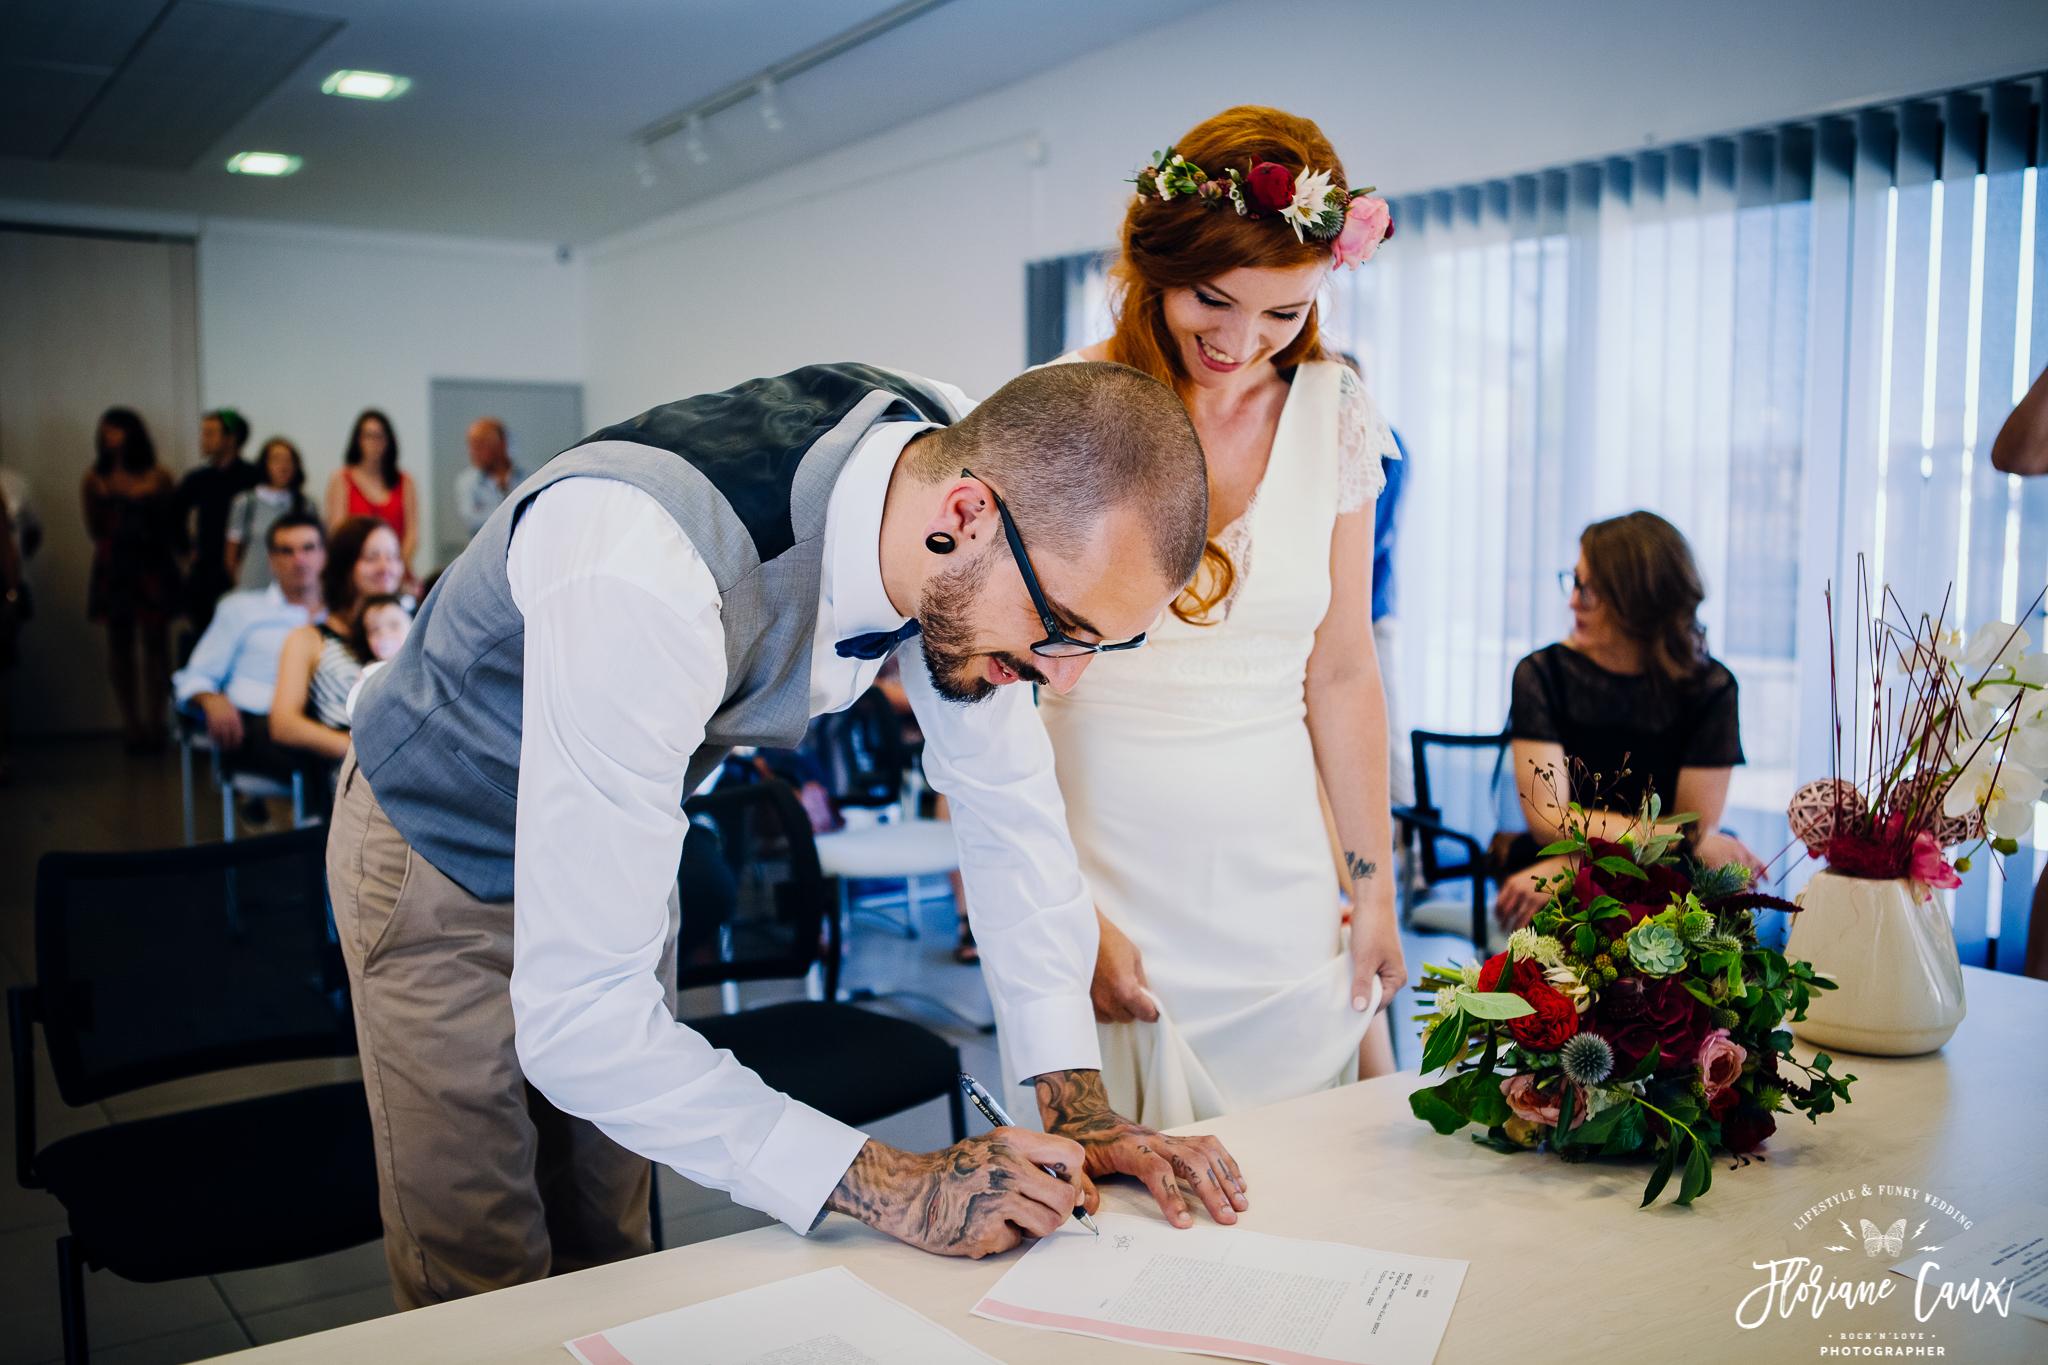 photographe-mariage-toulouse-rocknroll-maries-tatoues-floriane-caux-33